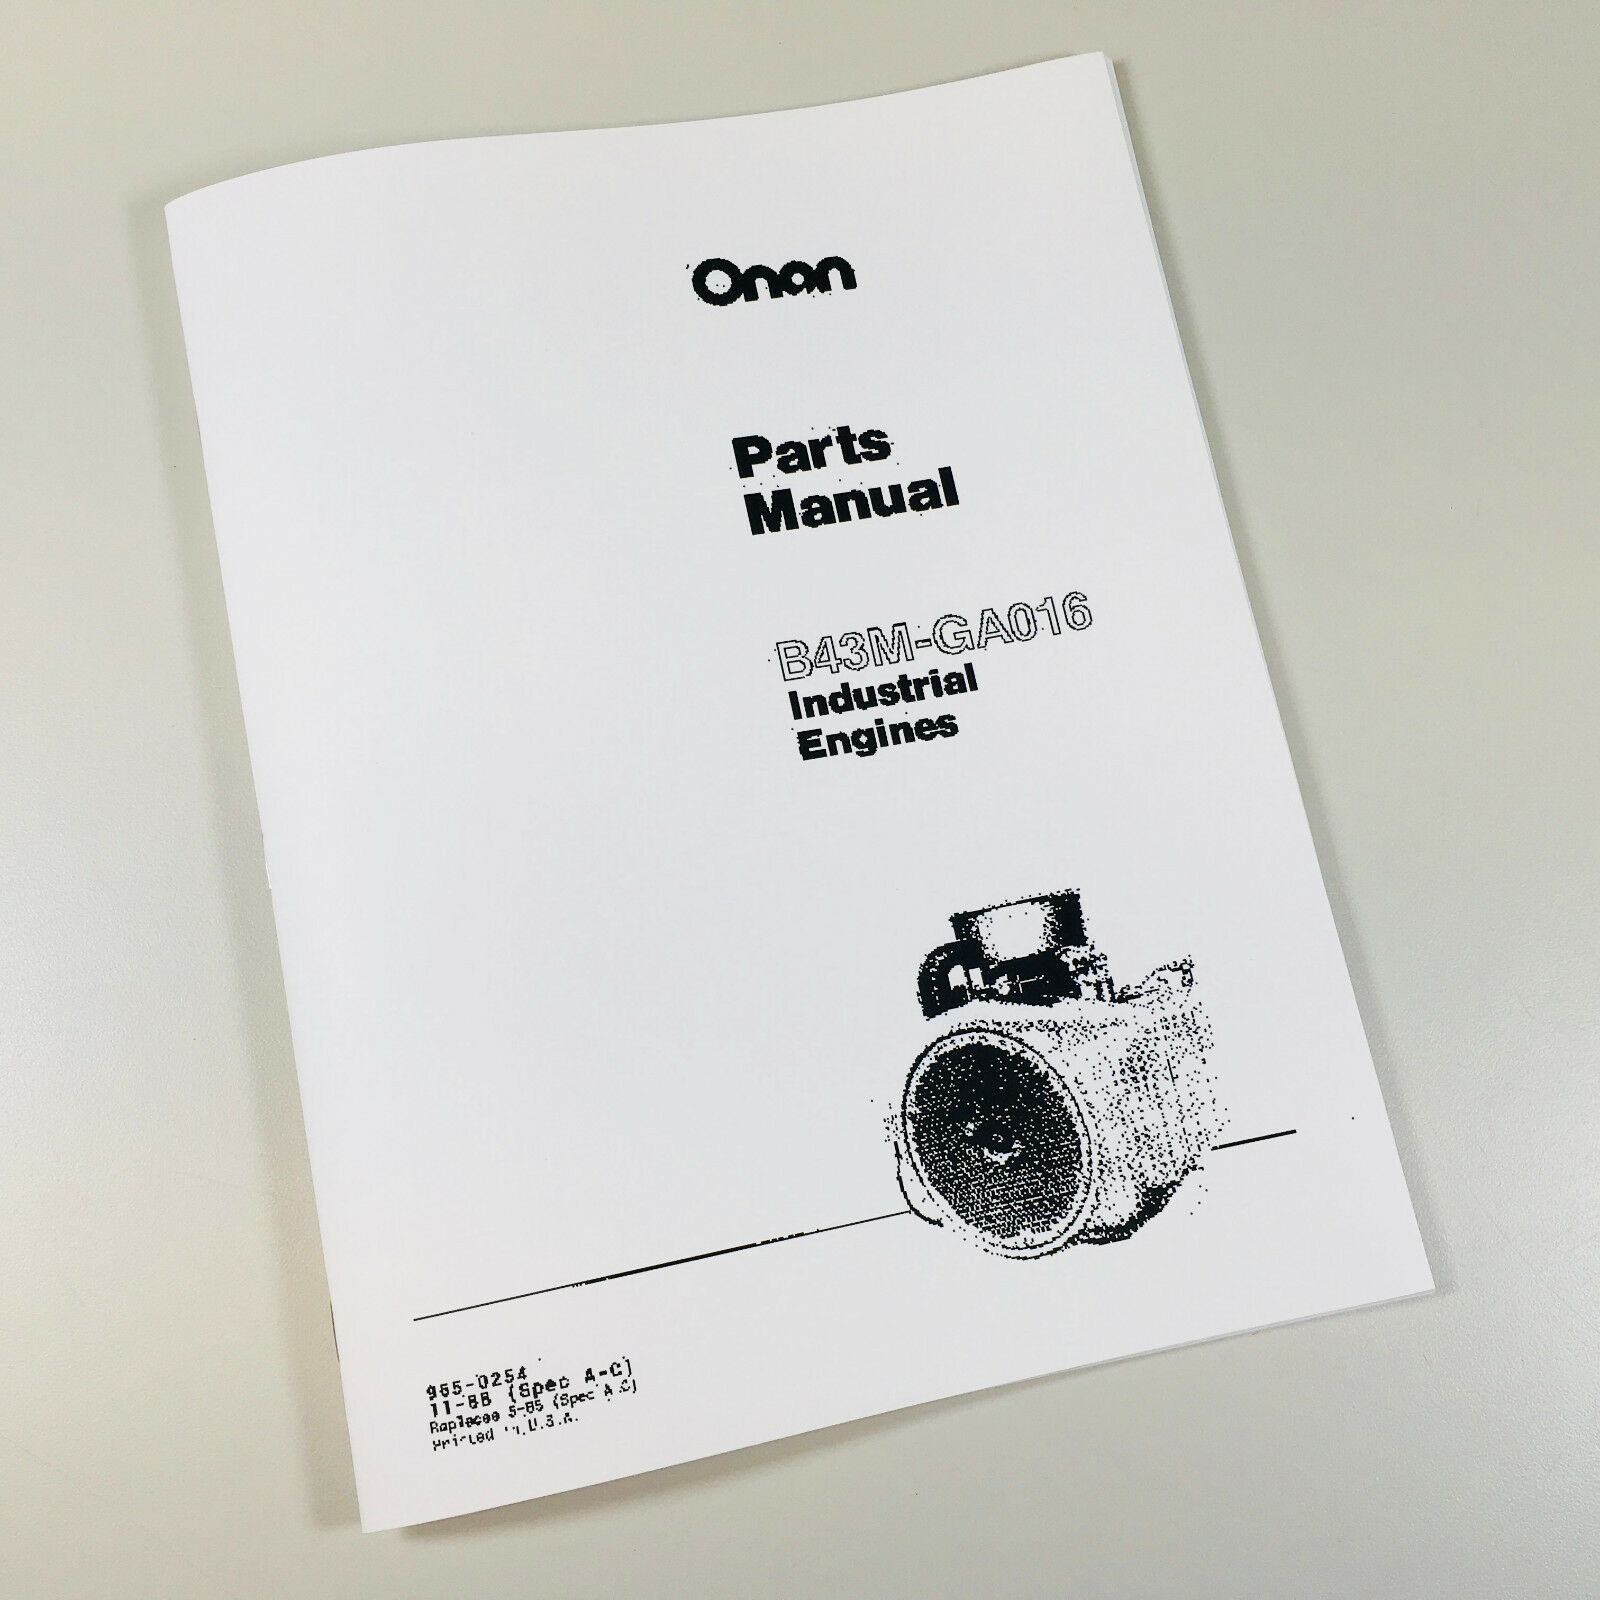 Details about CASE 446 GARDEN TRACTOR ONAN B43M GA016 INDUSTRIAL ENGINE  PARTS MANUAL CATALOG